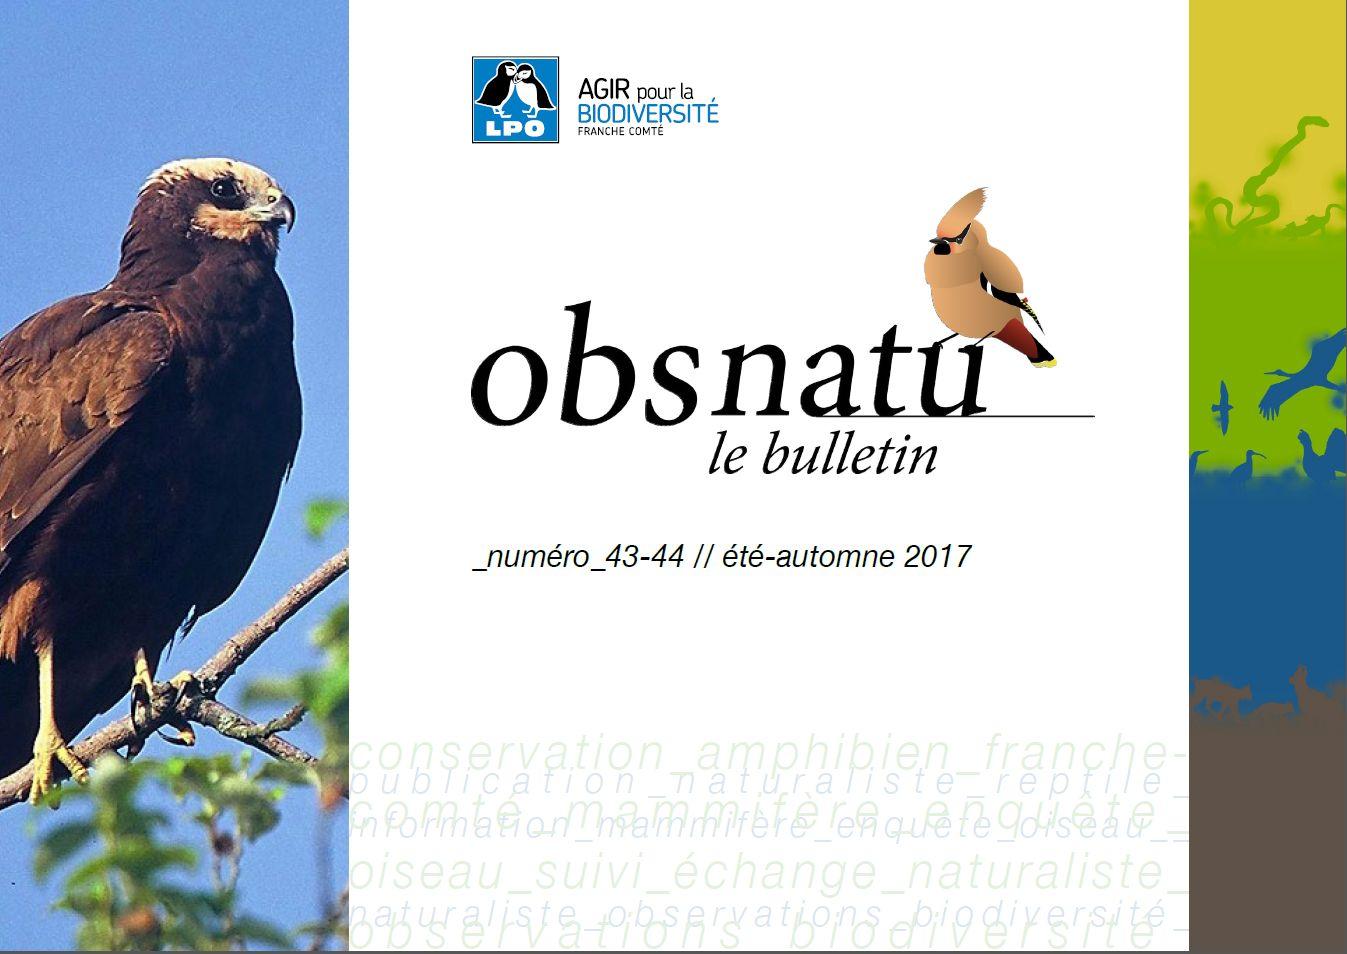 https://cdnfiles2.biolovision.net/franche-comte.lpo.fr/userfiles/publications/Obsnatubulls/Obsnatn43-44ete-aut2017couv.pdf.jpg